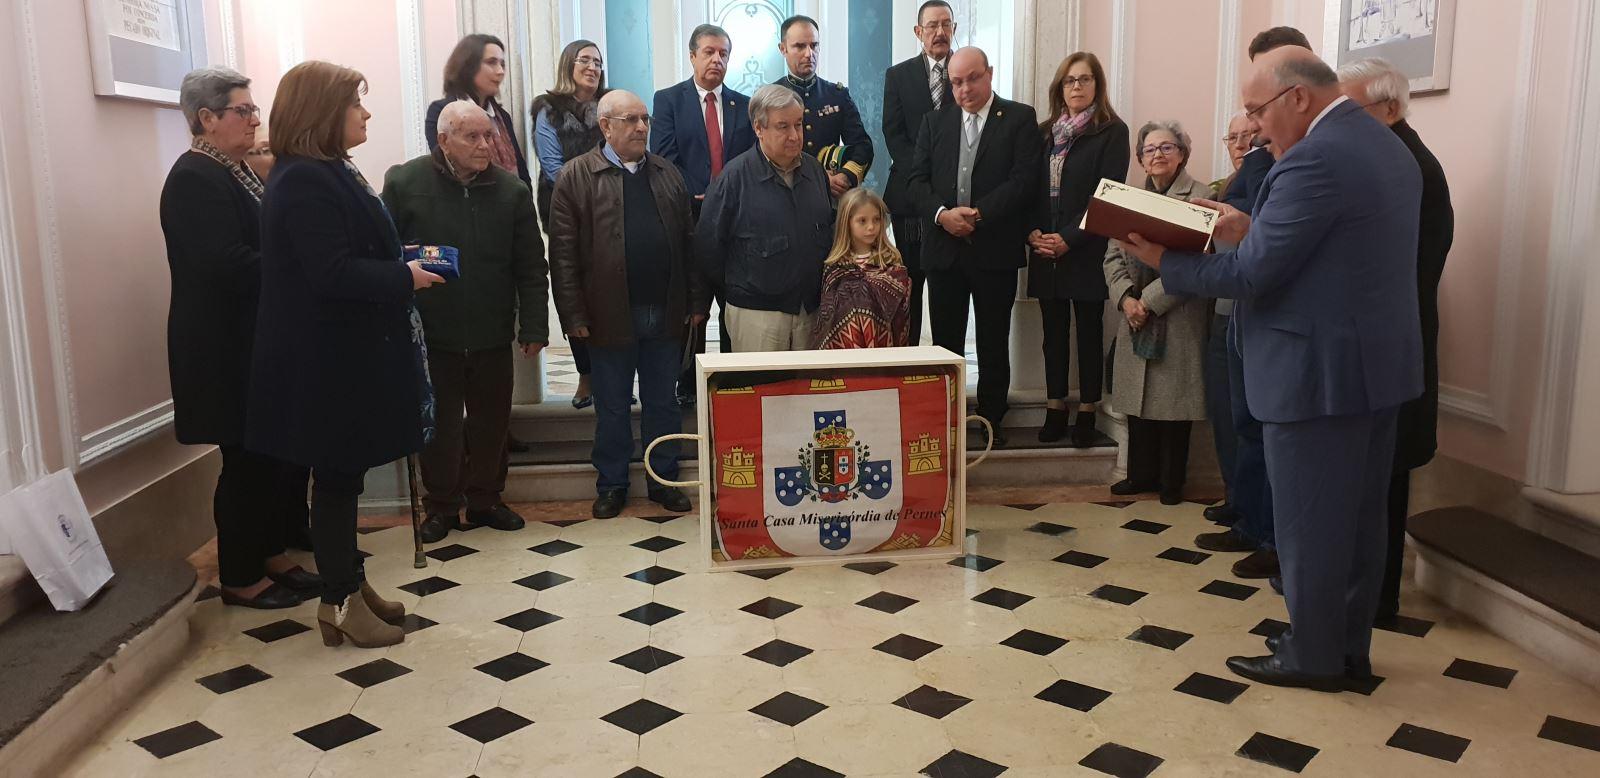 Pernes | Misericórdia oferece tapeçaria a líder da ONU